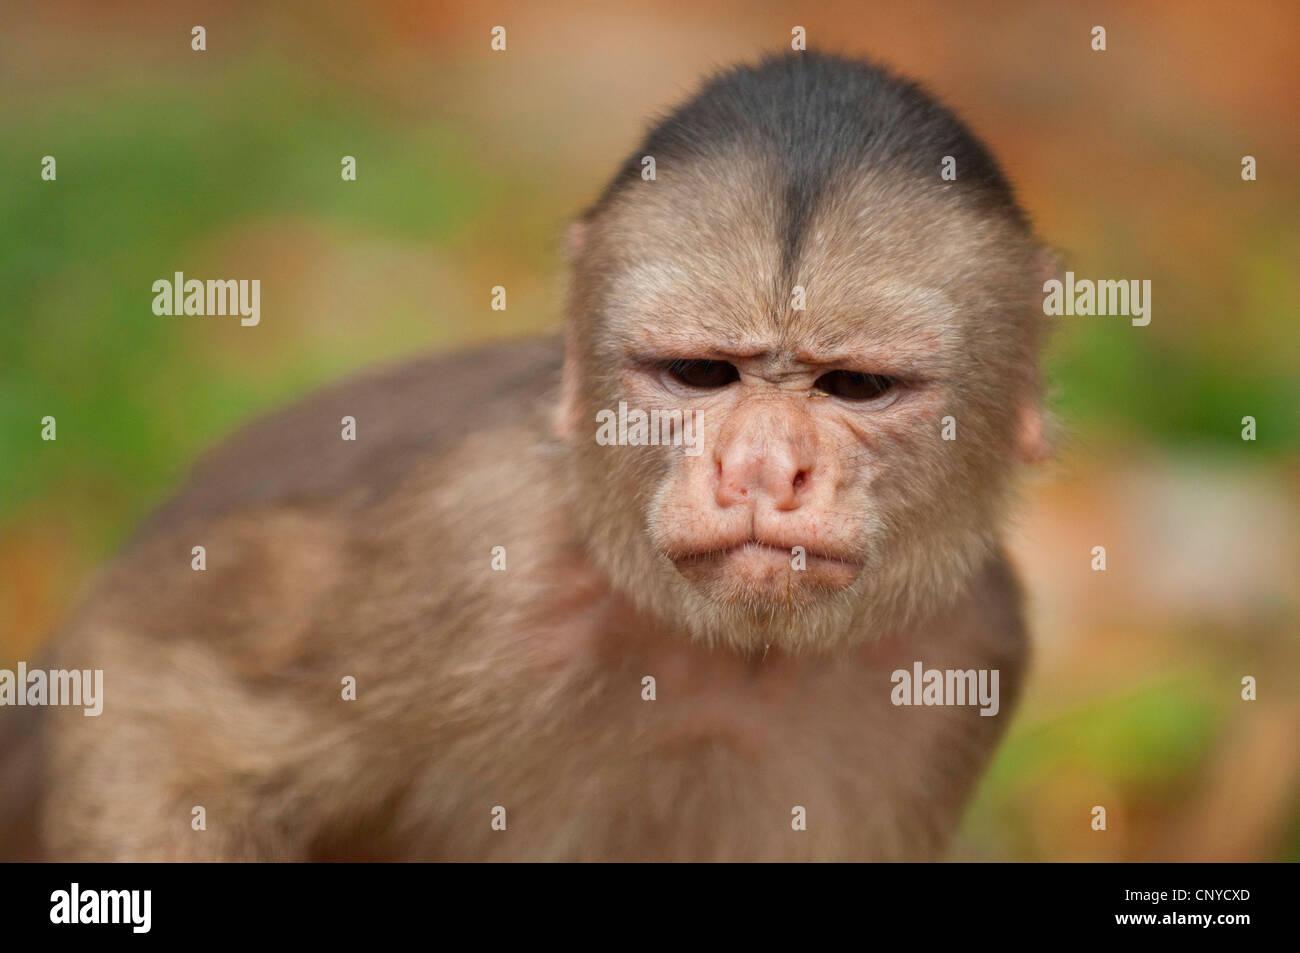 capuchins, ring-tailed monkeys (Cebus spec.), front portrait, frowning, Ecuador, Pastaza - Stock Image